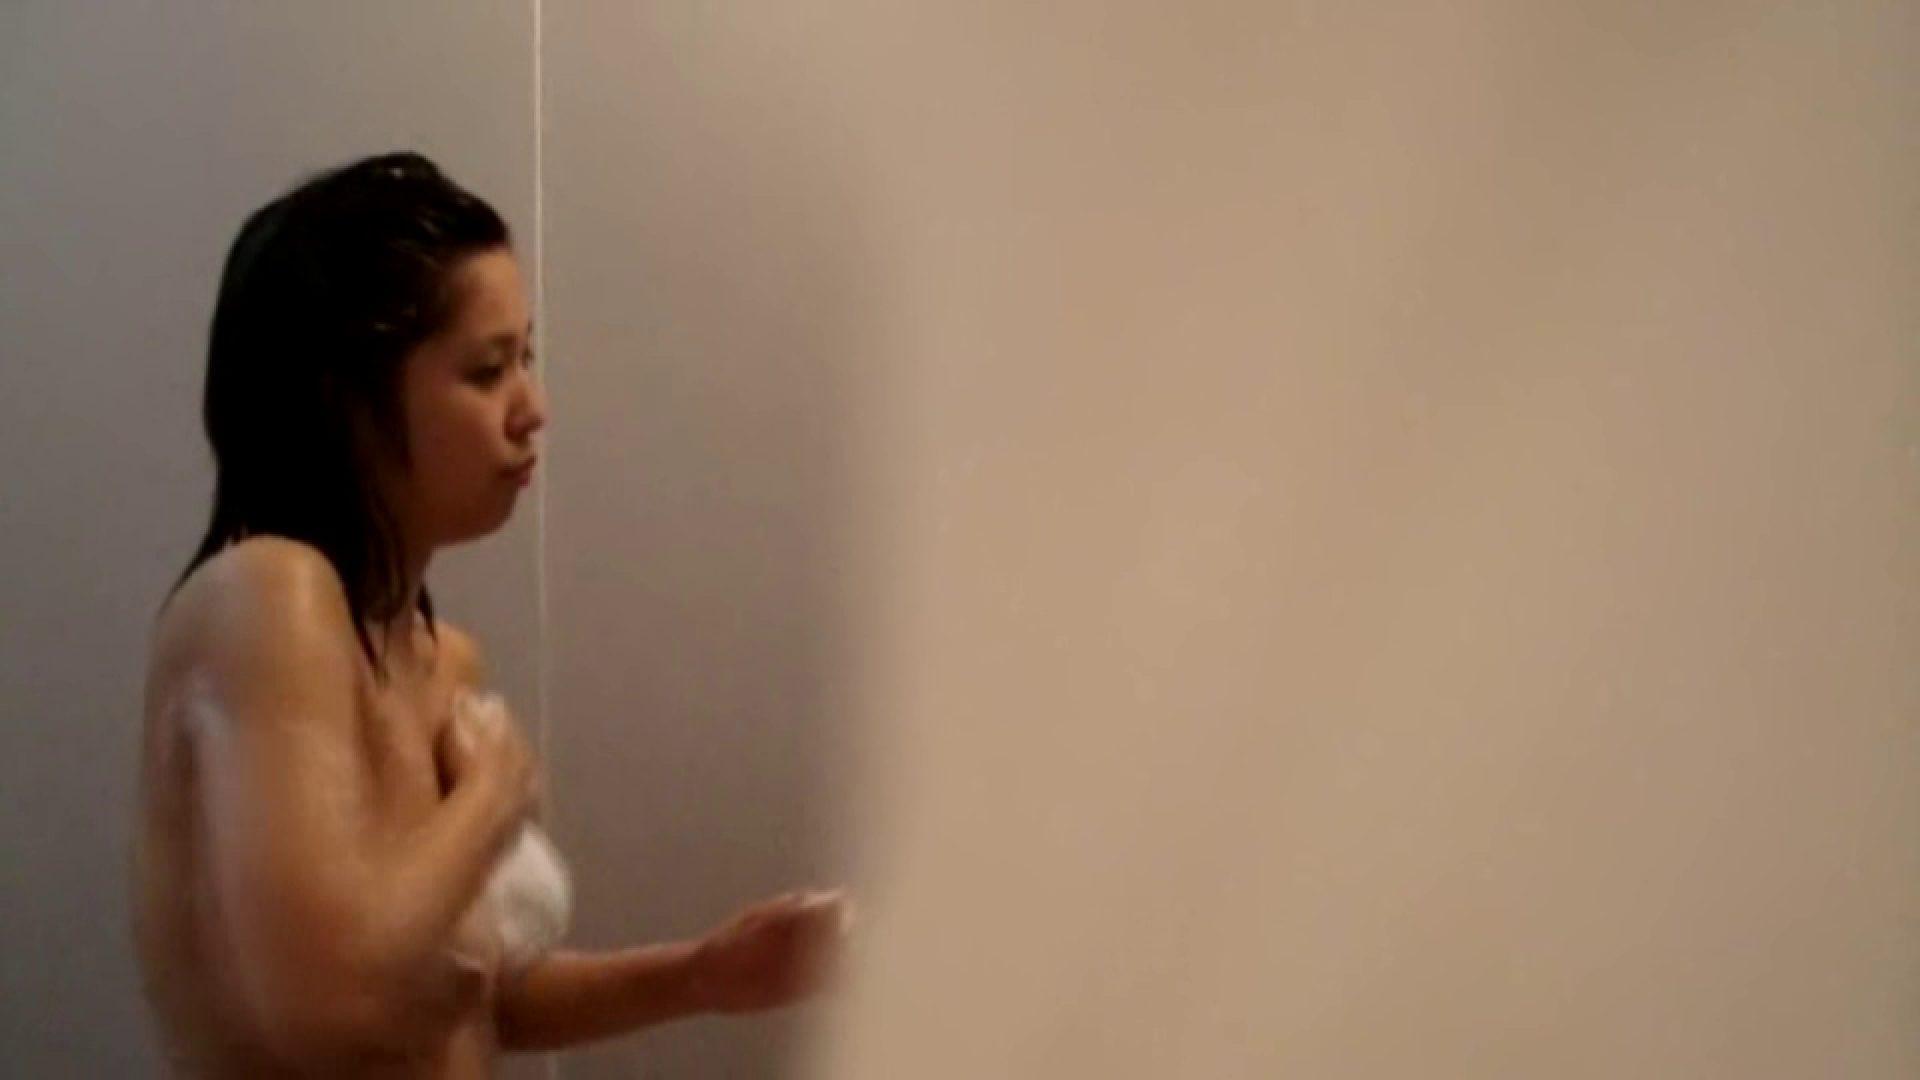 vol.2 葵のグラドル顔負けの爆乳を入浴シーンでどうぞ。 巨乳  64PIX 48